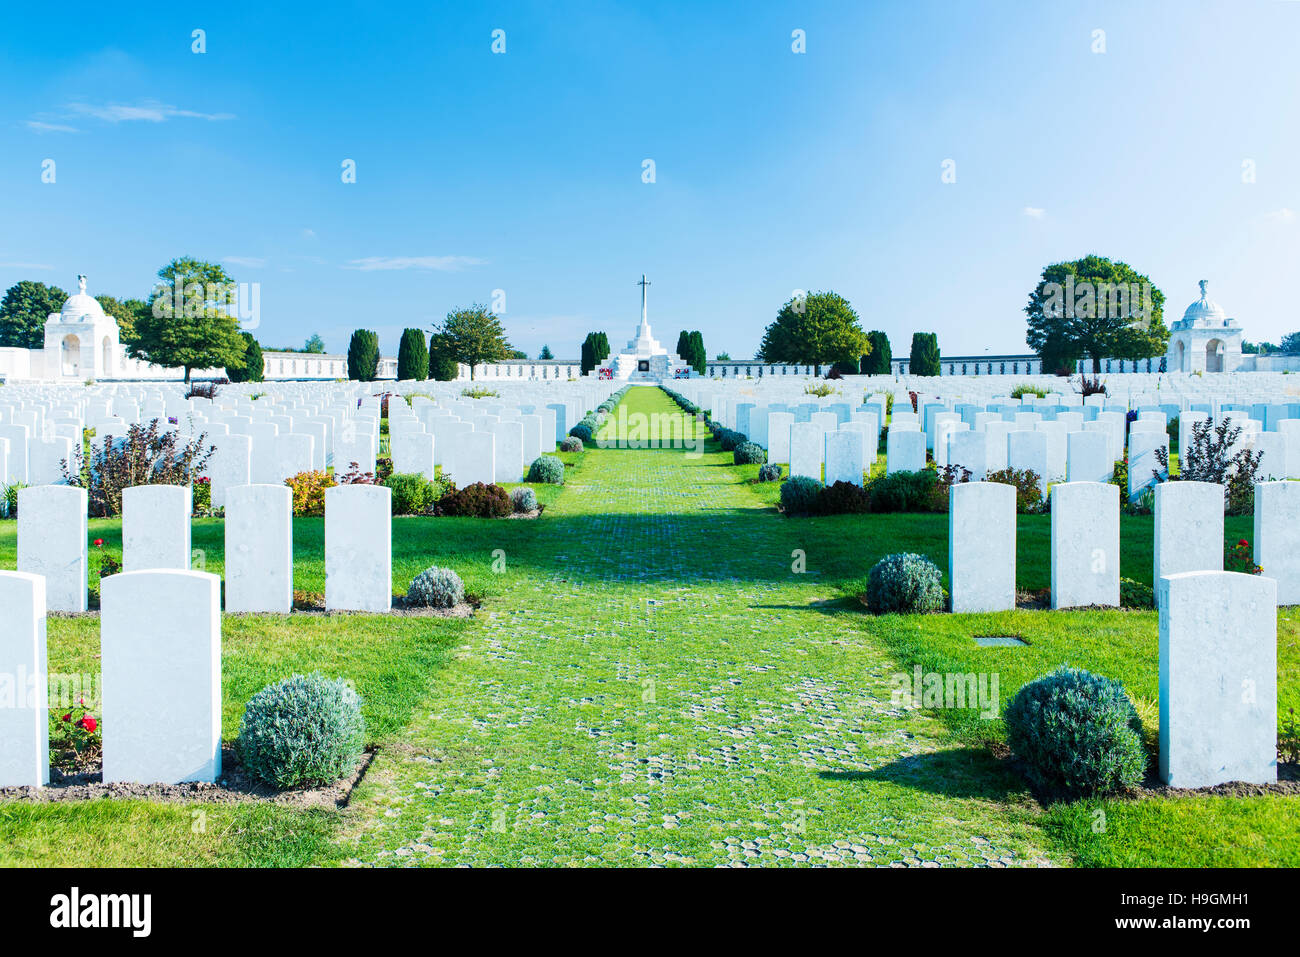 Tyne Cot Commonwealth War Graves Cemetery and Memorial near Zonnebeke in Belgium - Stock Image